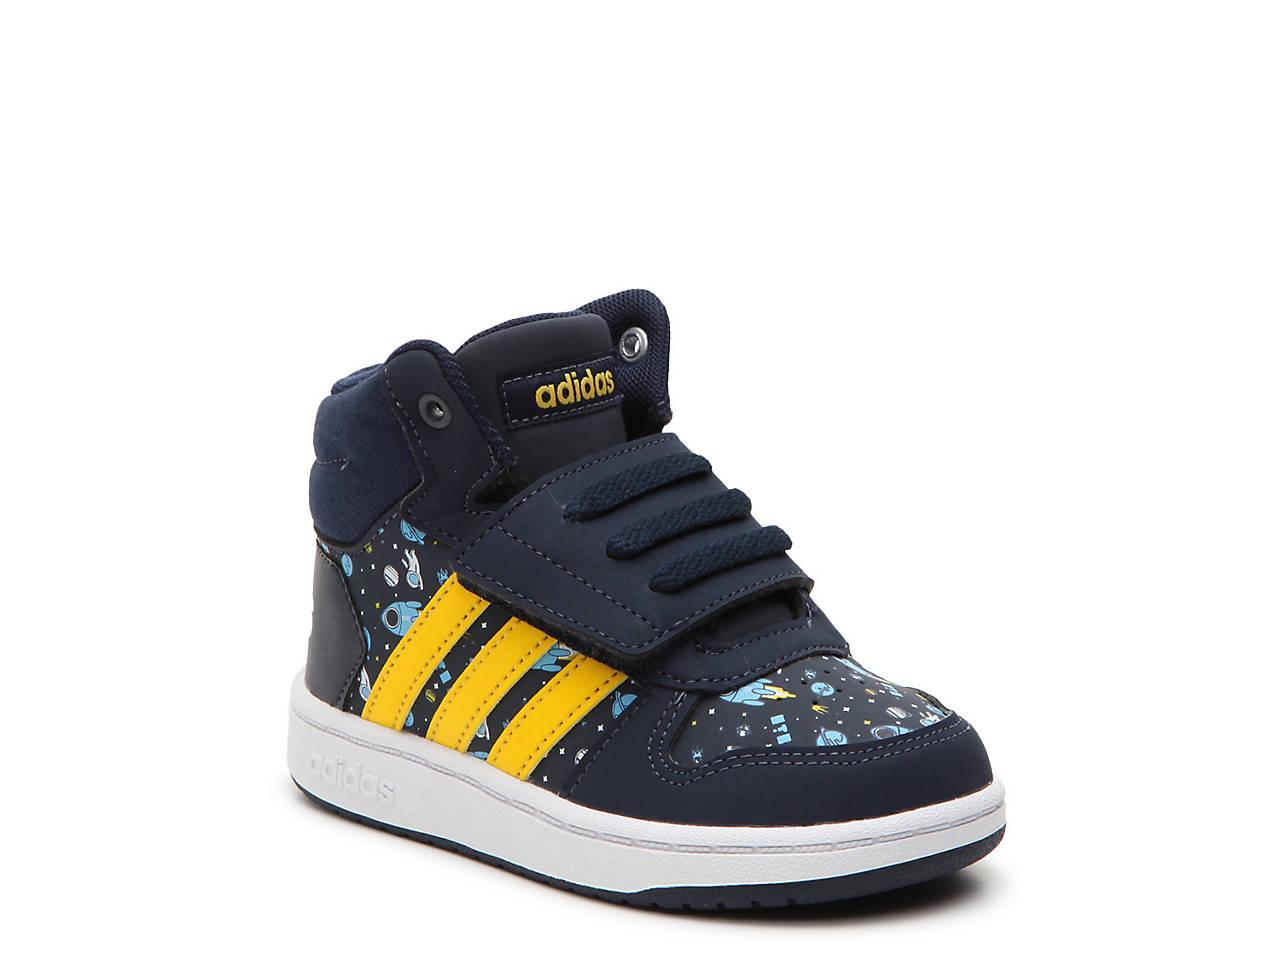 adidas basket mid - 2 bambino alta scarpa bambini scarpe dsw